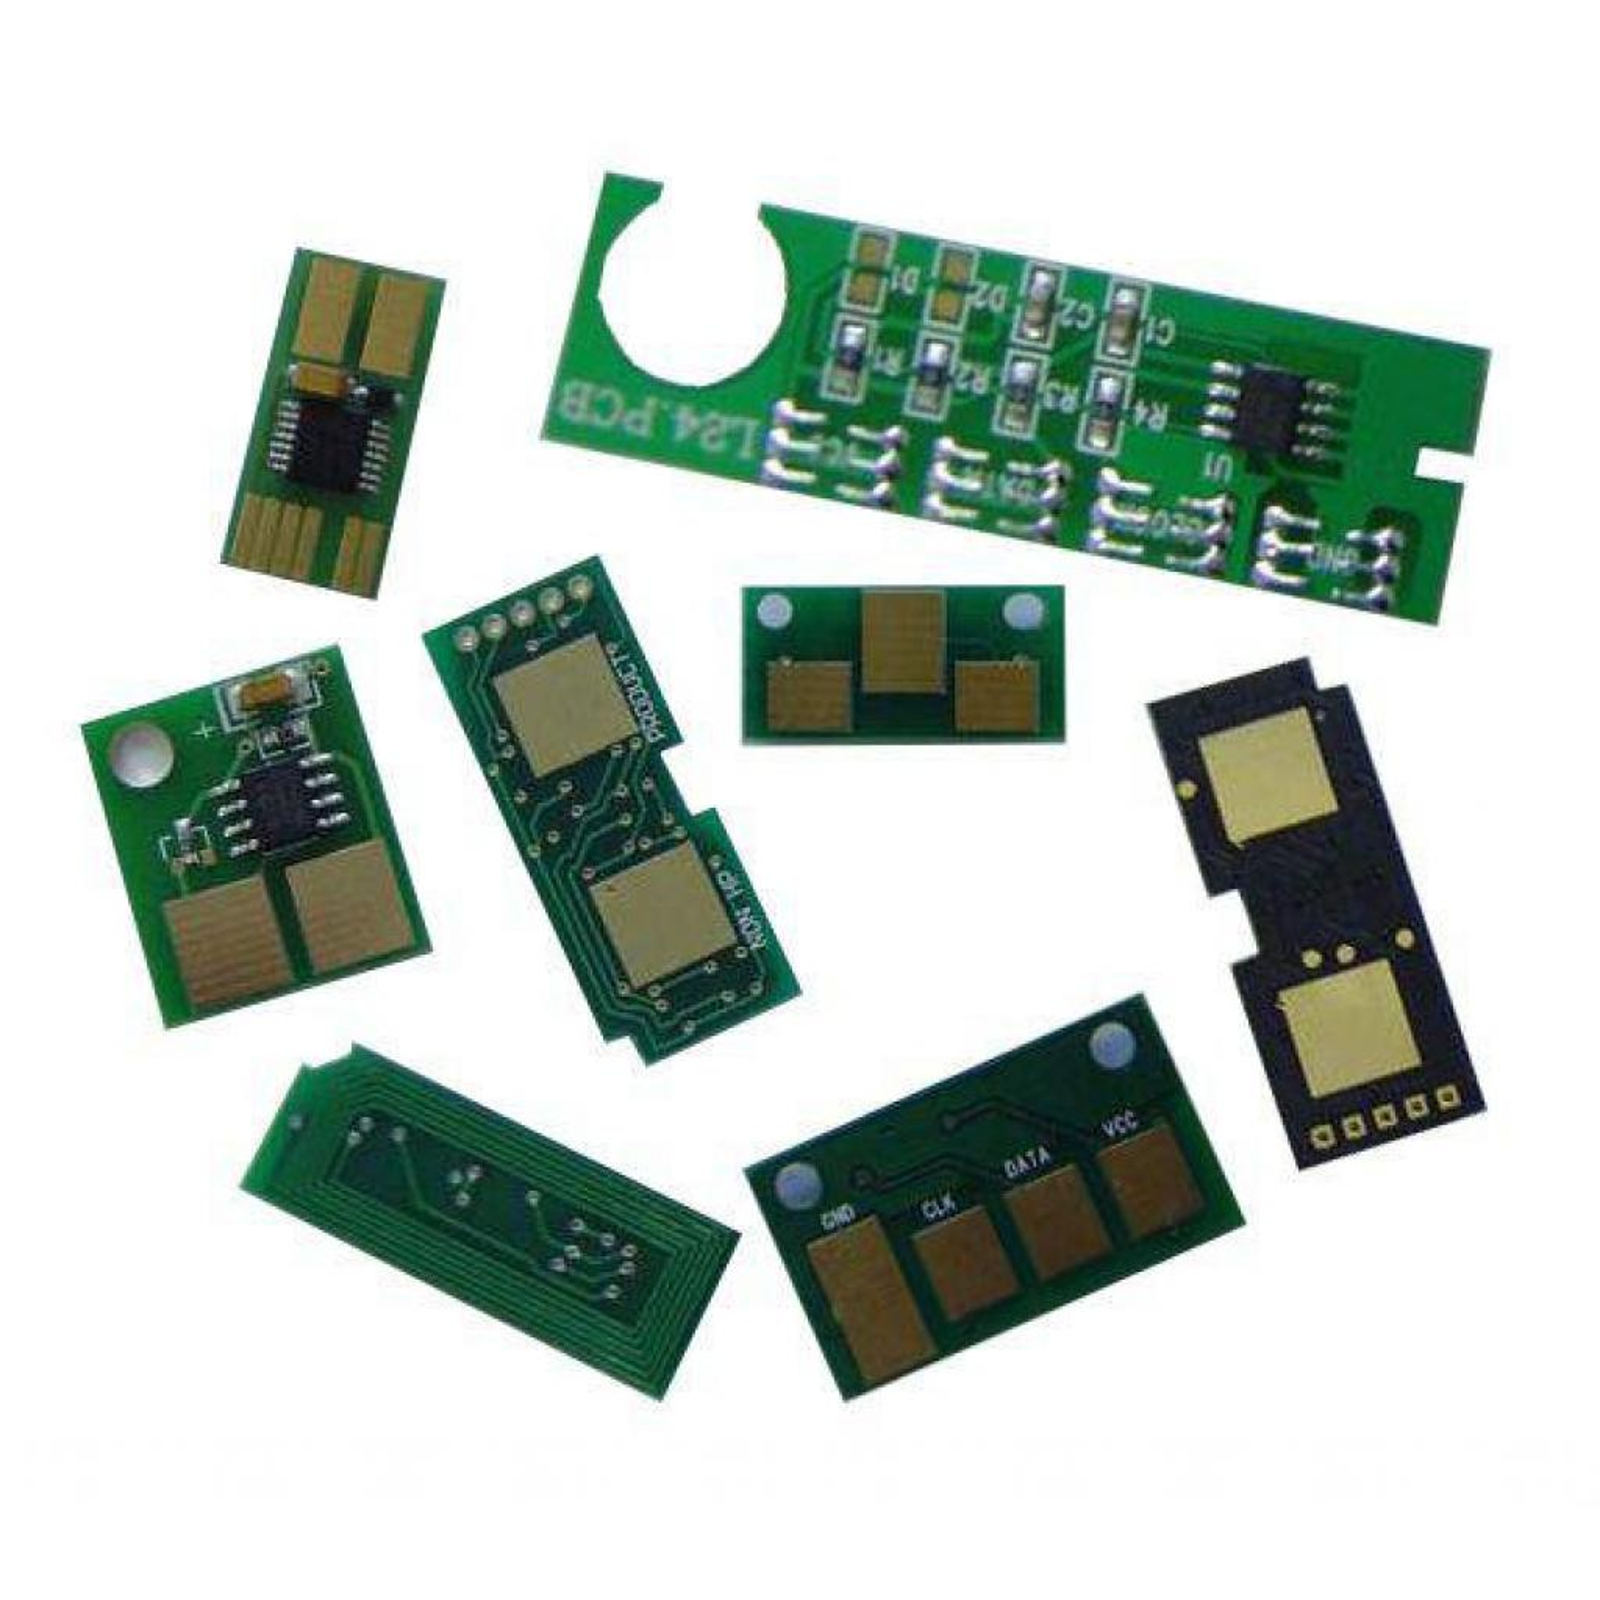 Чип для картриджа CANON 732 ДЛЯ LBP7780 6.4K CYAN Everprint (CHIP-CAN-LBP7780-C)